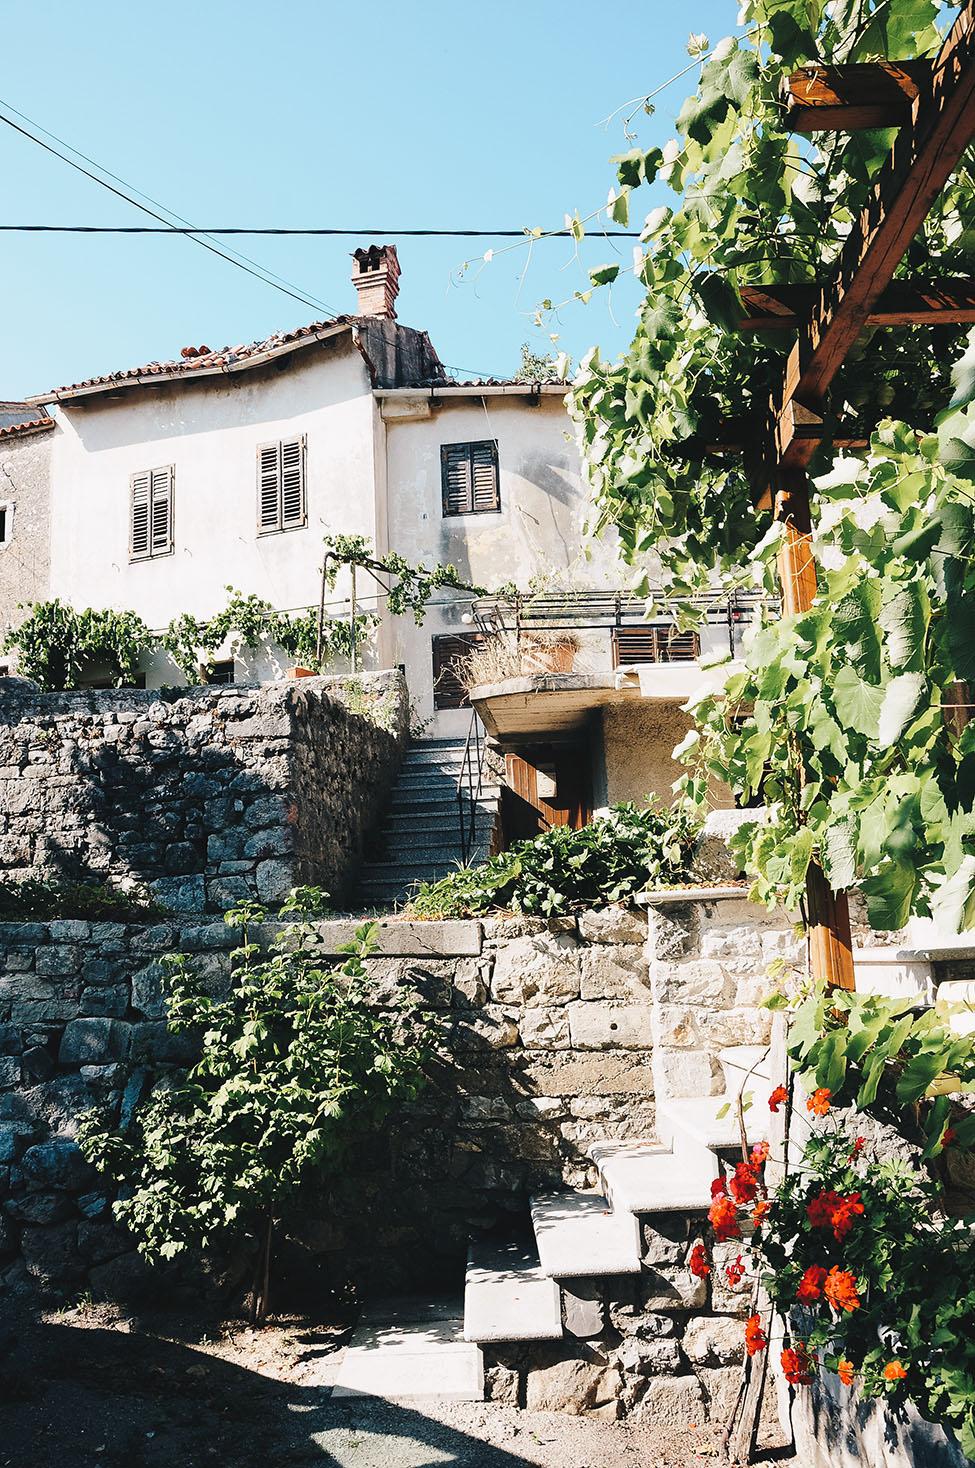 village de stanjel, vallée de la vipava, road-trip en slovénie